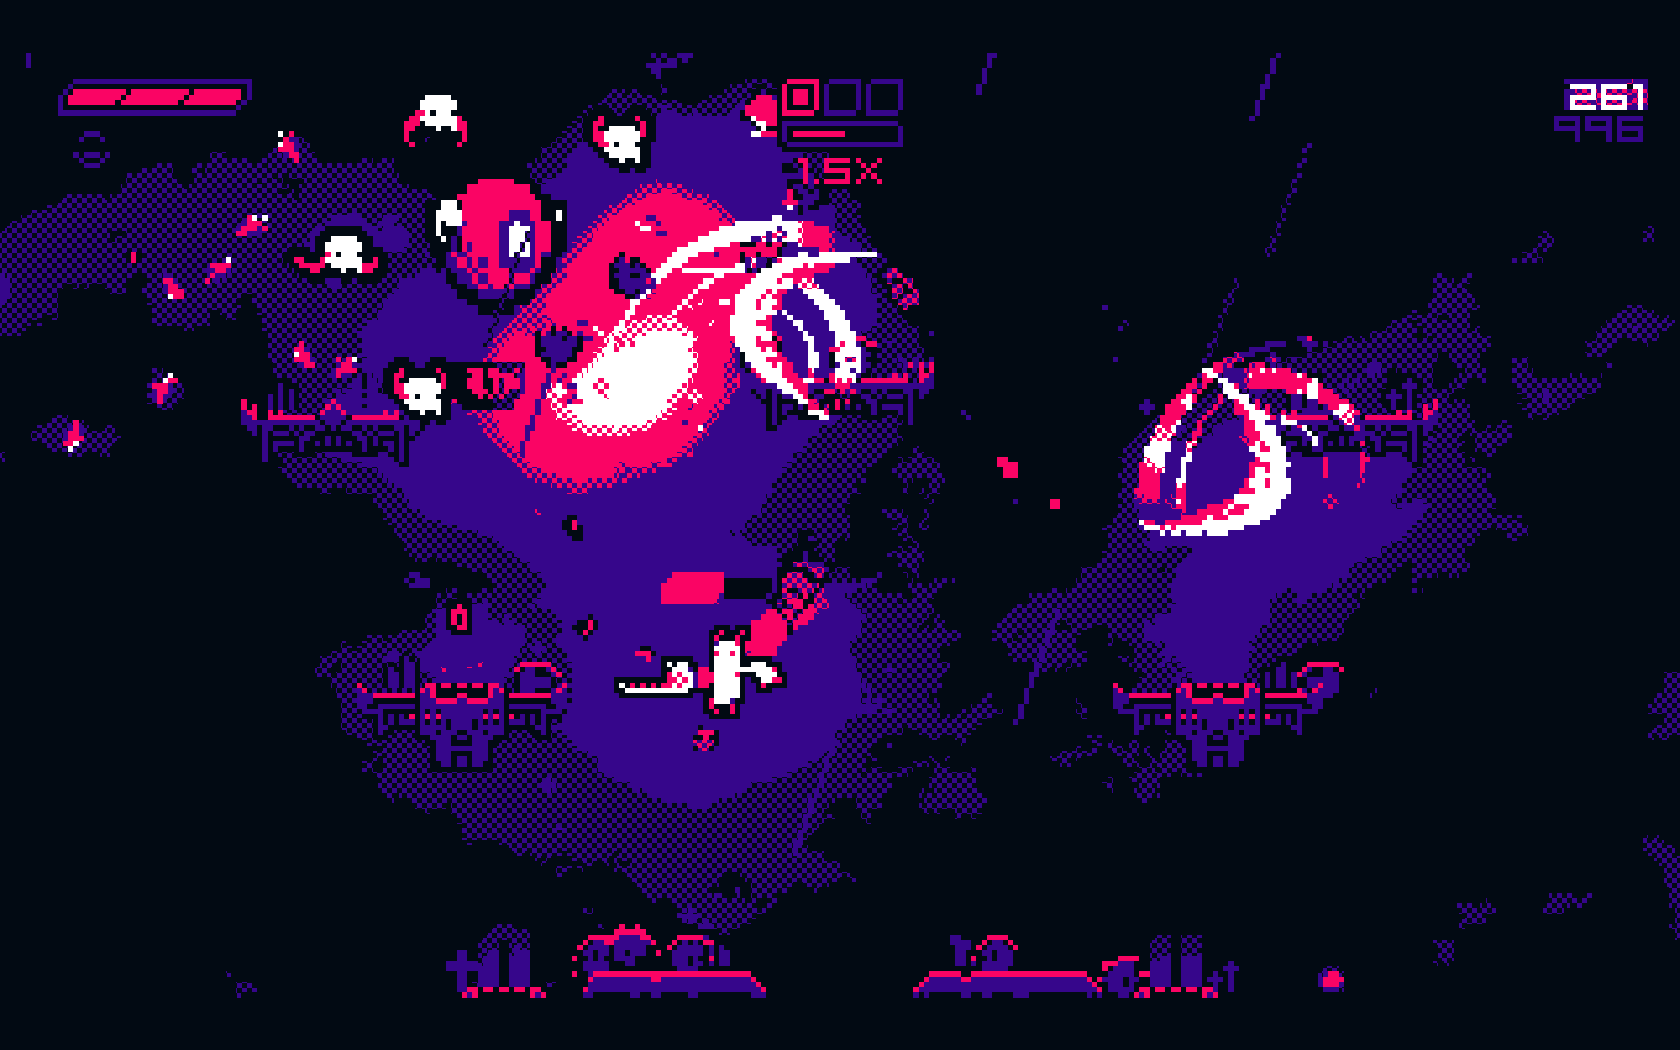 arcade_purple_2.jpg